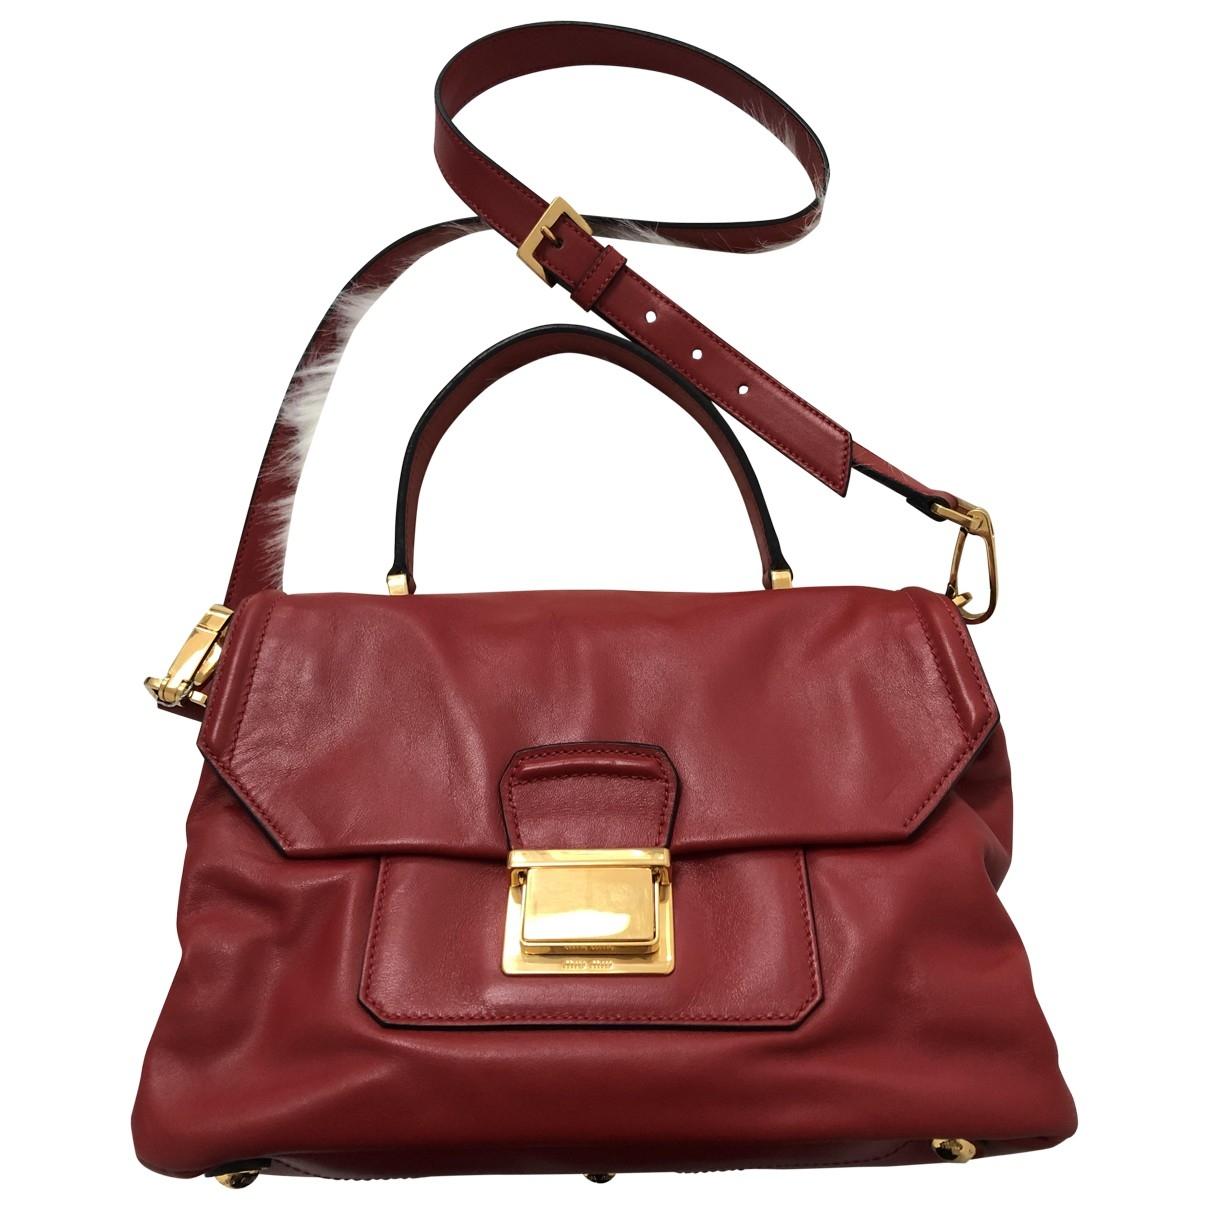 Miu Miu Madras Red Leather handbag for Women \N